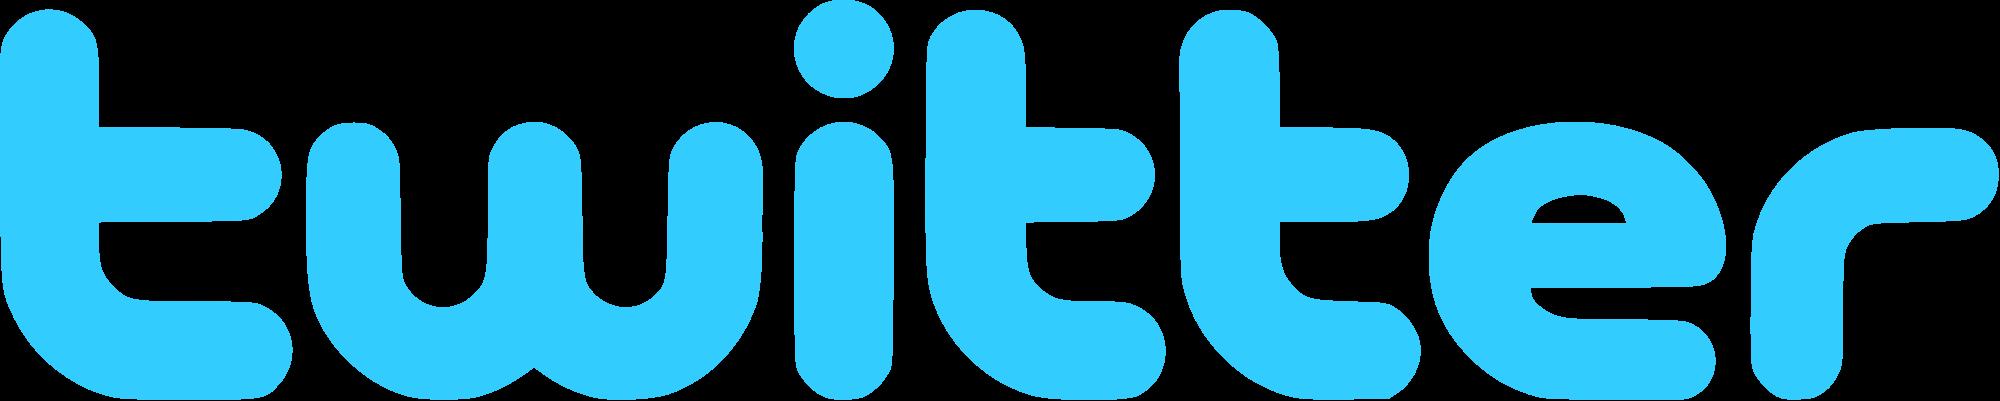 Twitter logo png transparent background. Images free download